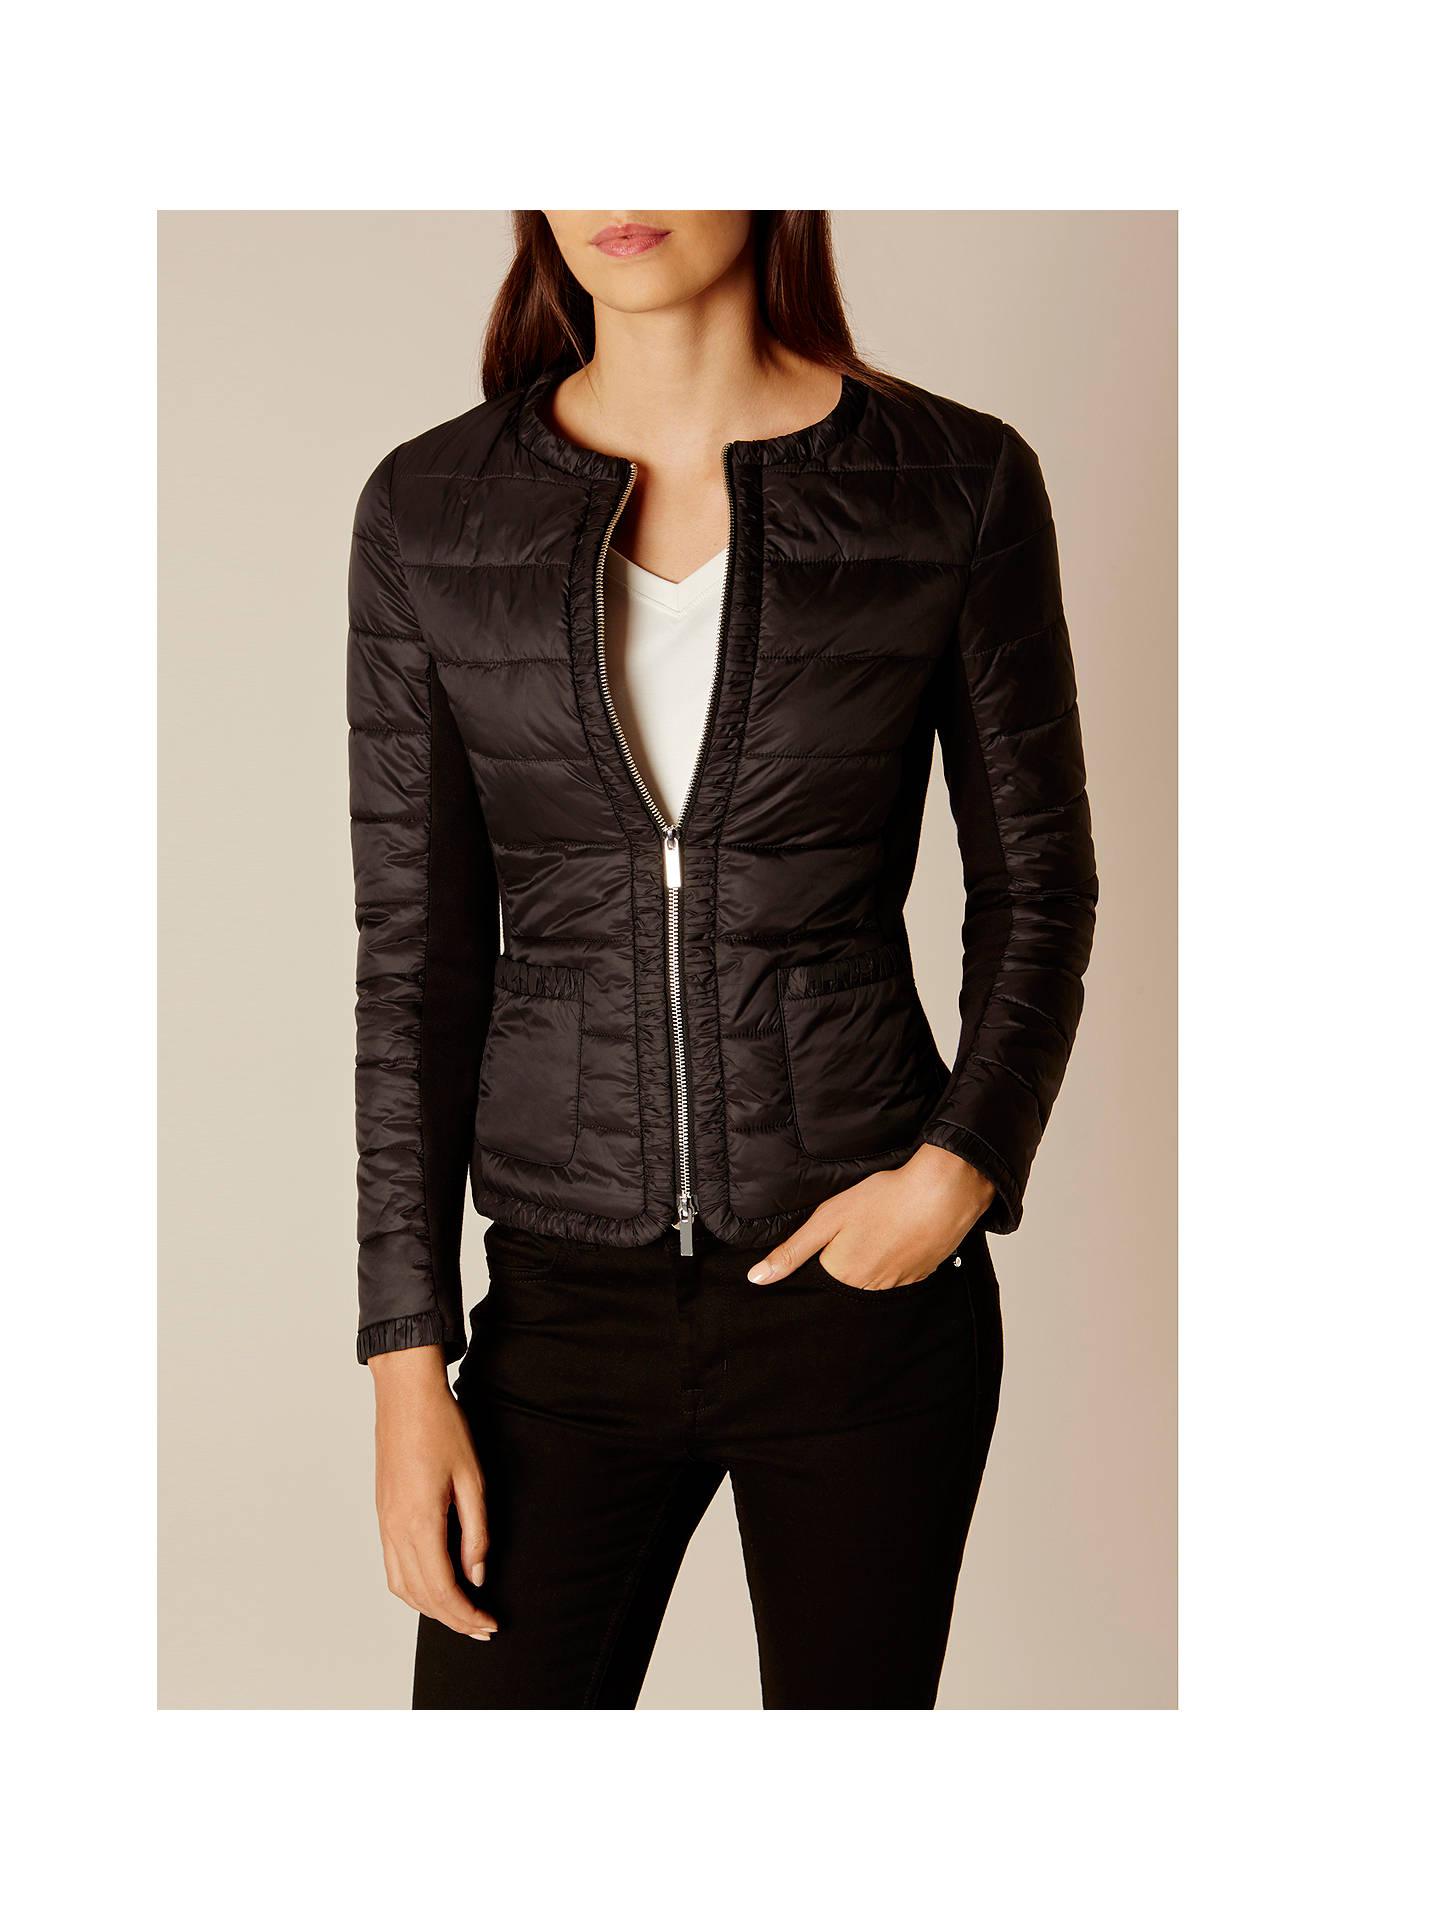 d141898fd3 ... Buy Karen Millen Lightweight Padded Jacket, Black, 6 Online at  johnlewis.com ...